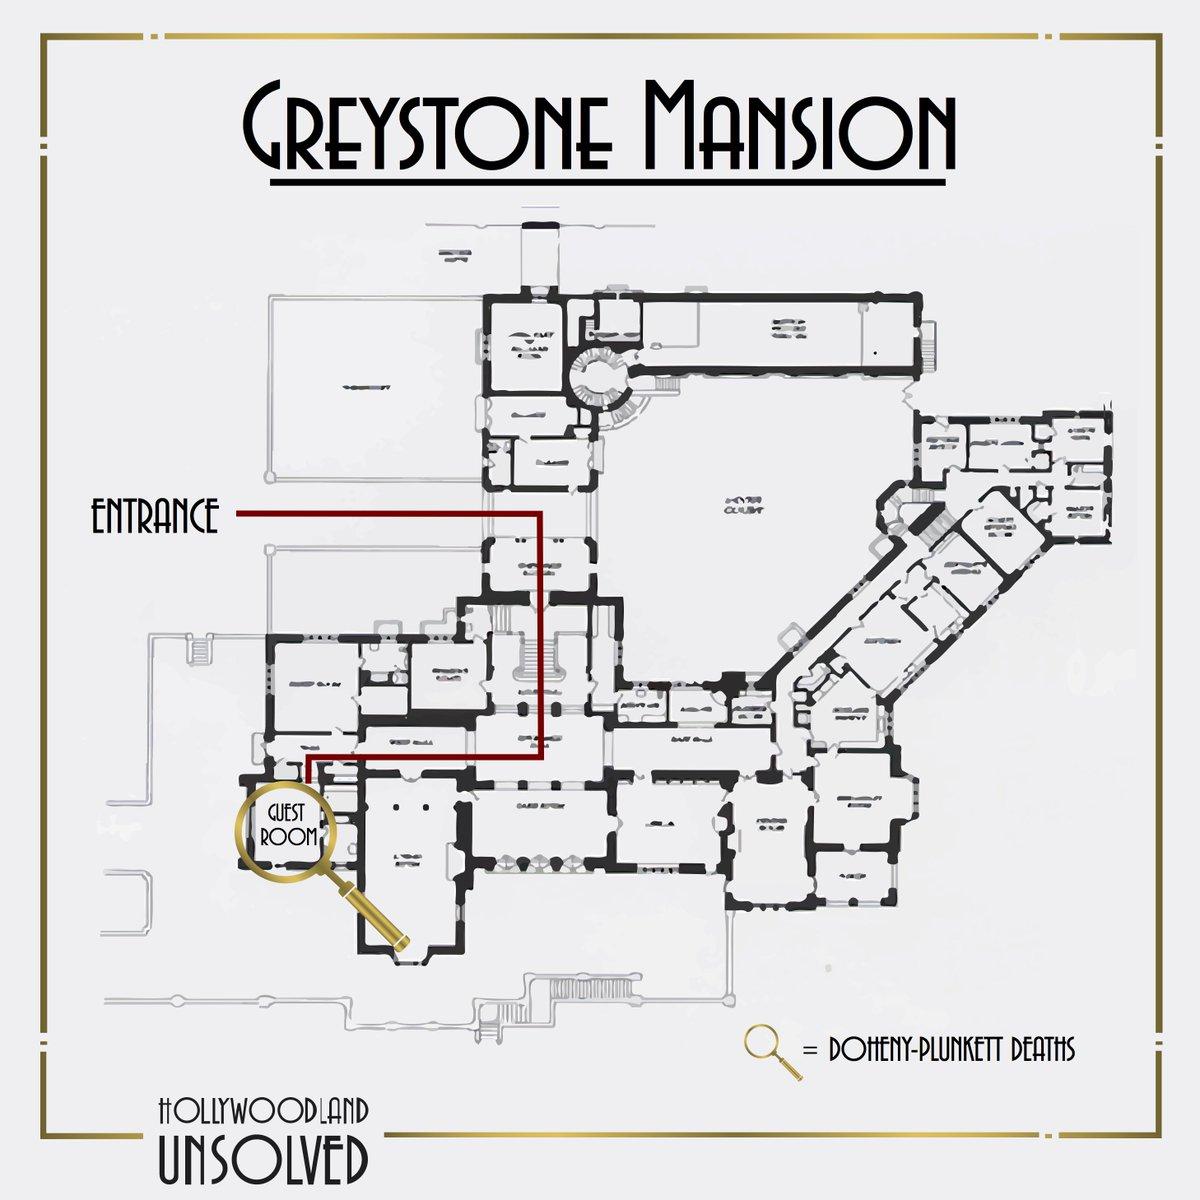 Greystone Mansion Floor Plan Meze Blog